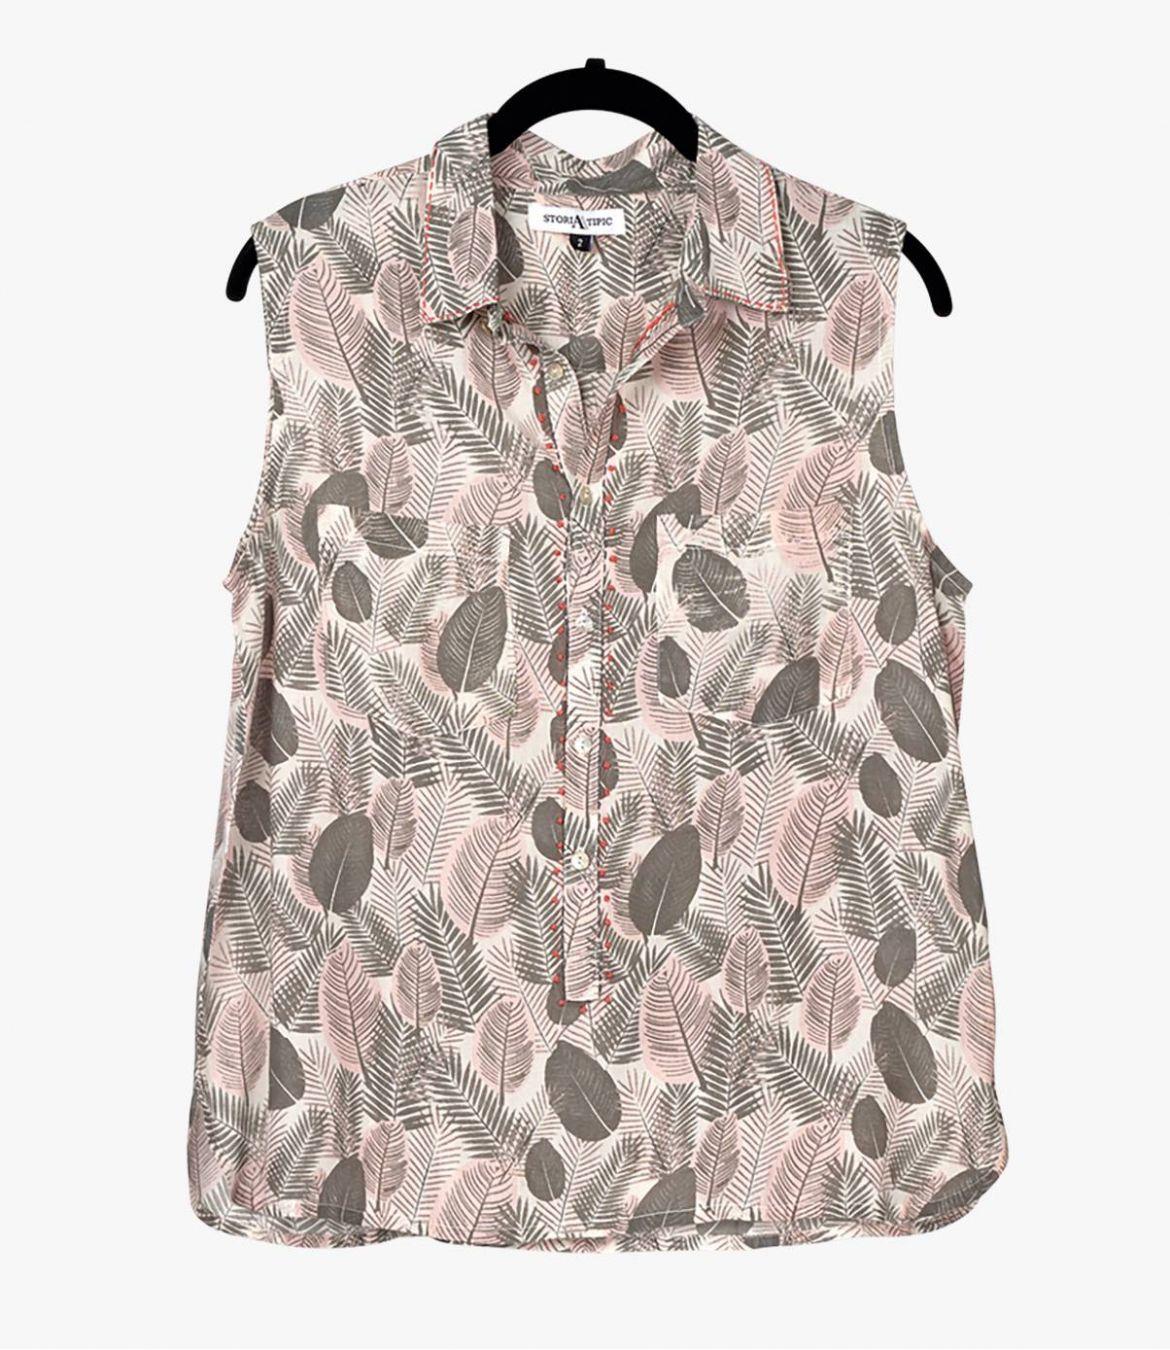 CIAO PLUME Women's Modal Shirt Storiatipic - 2